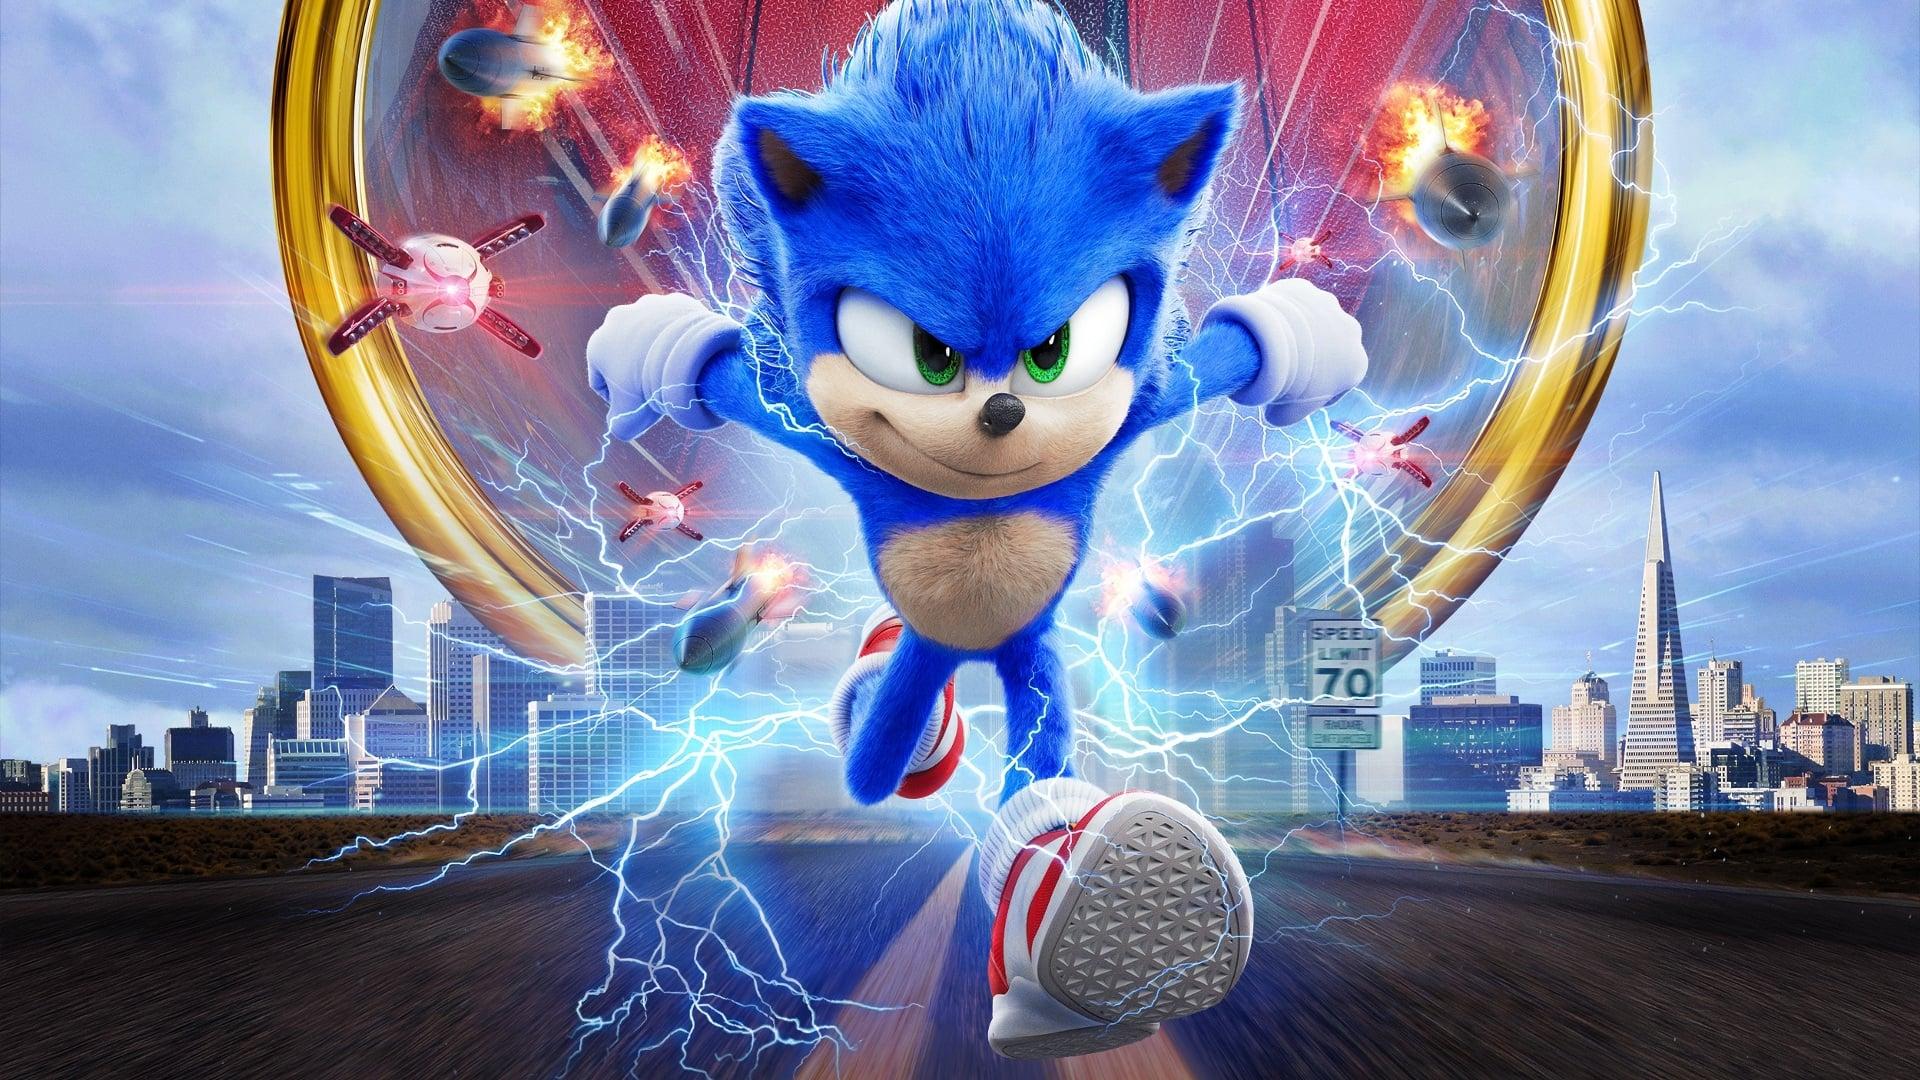 Sonic the Hedgehog [2020]